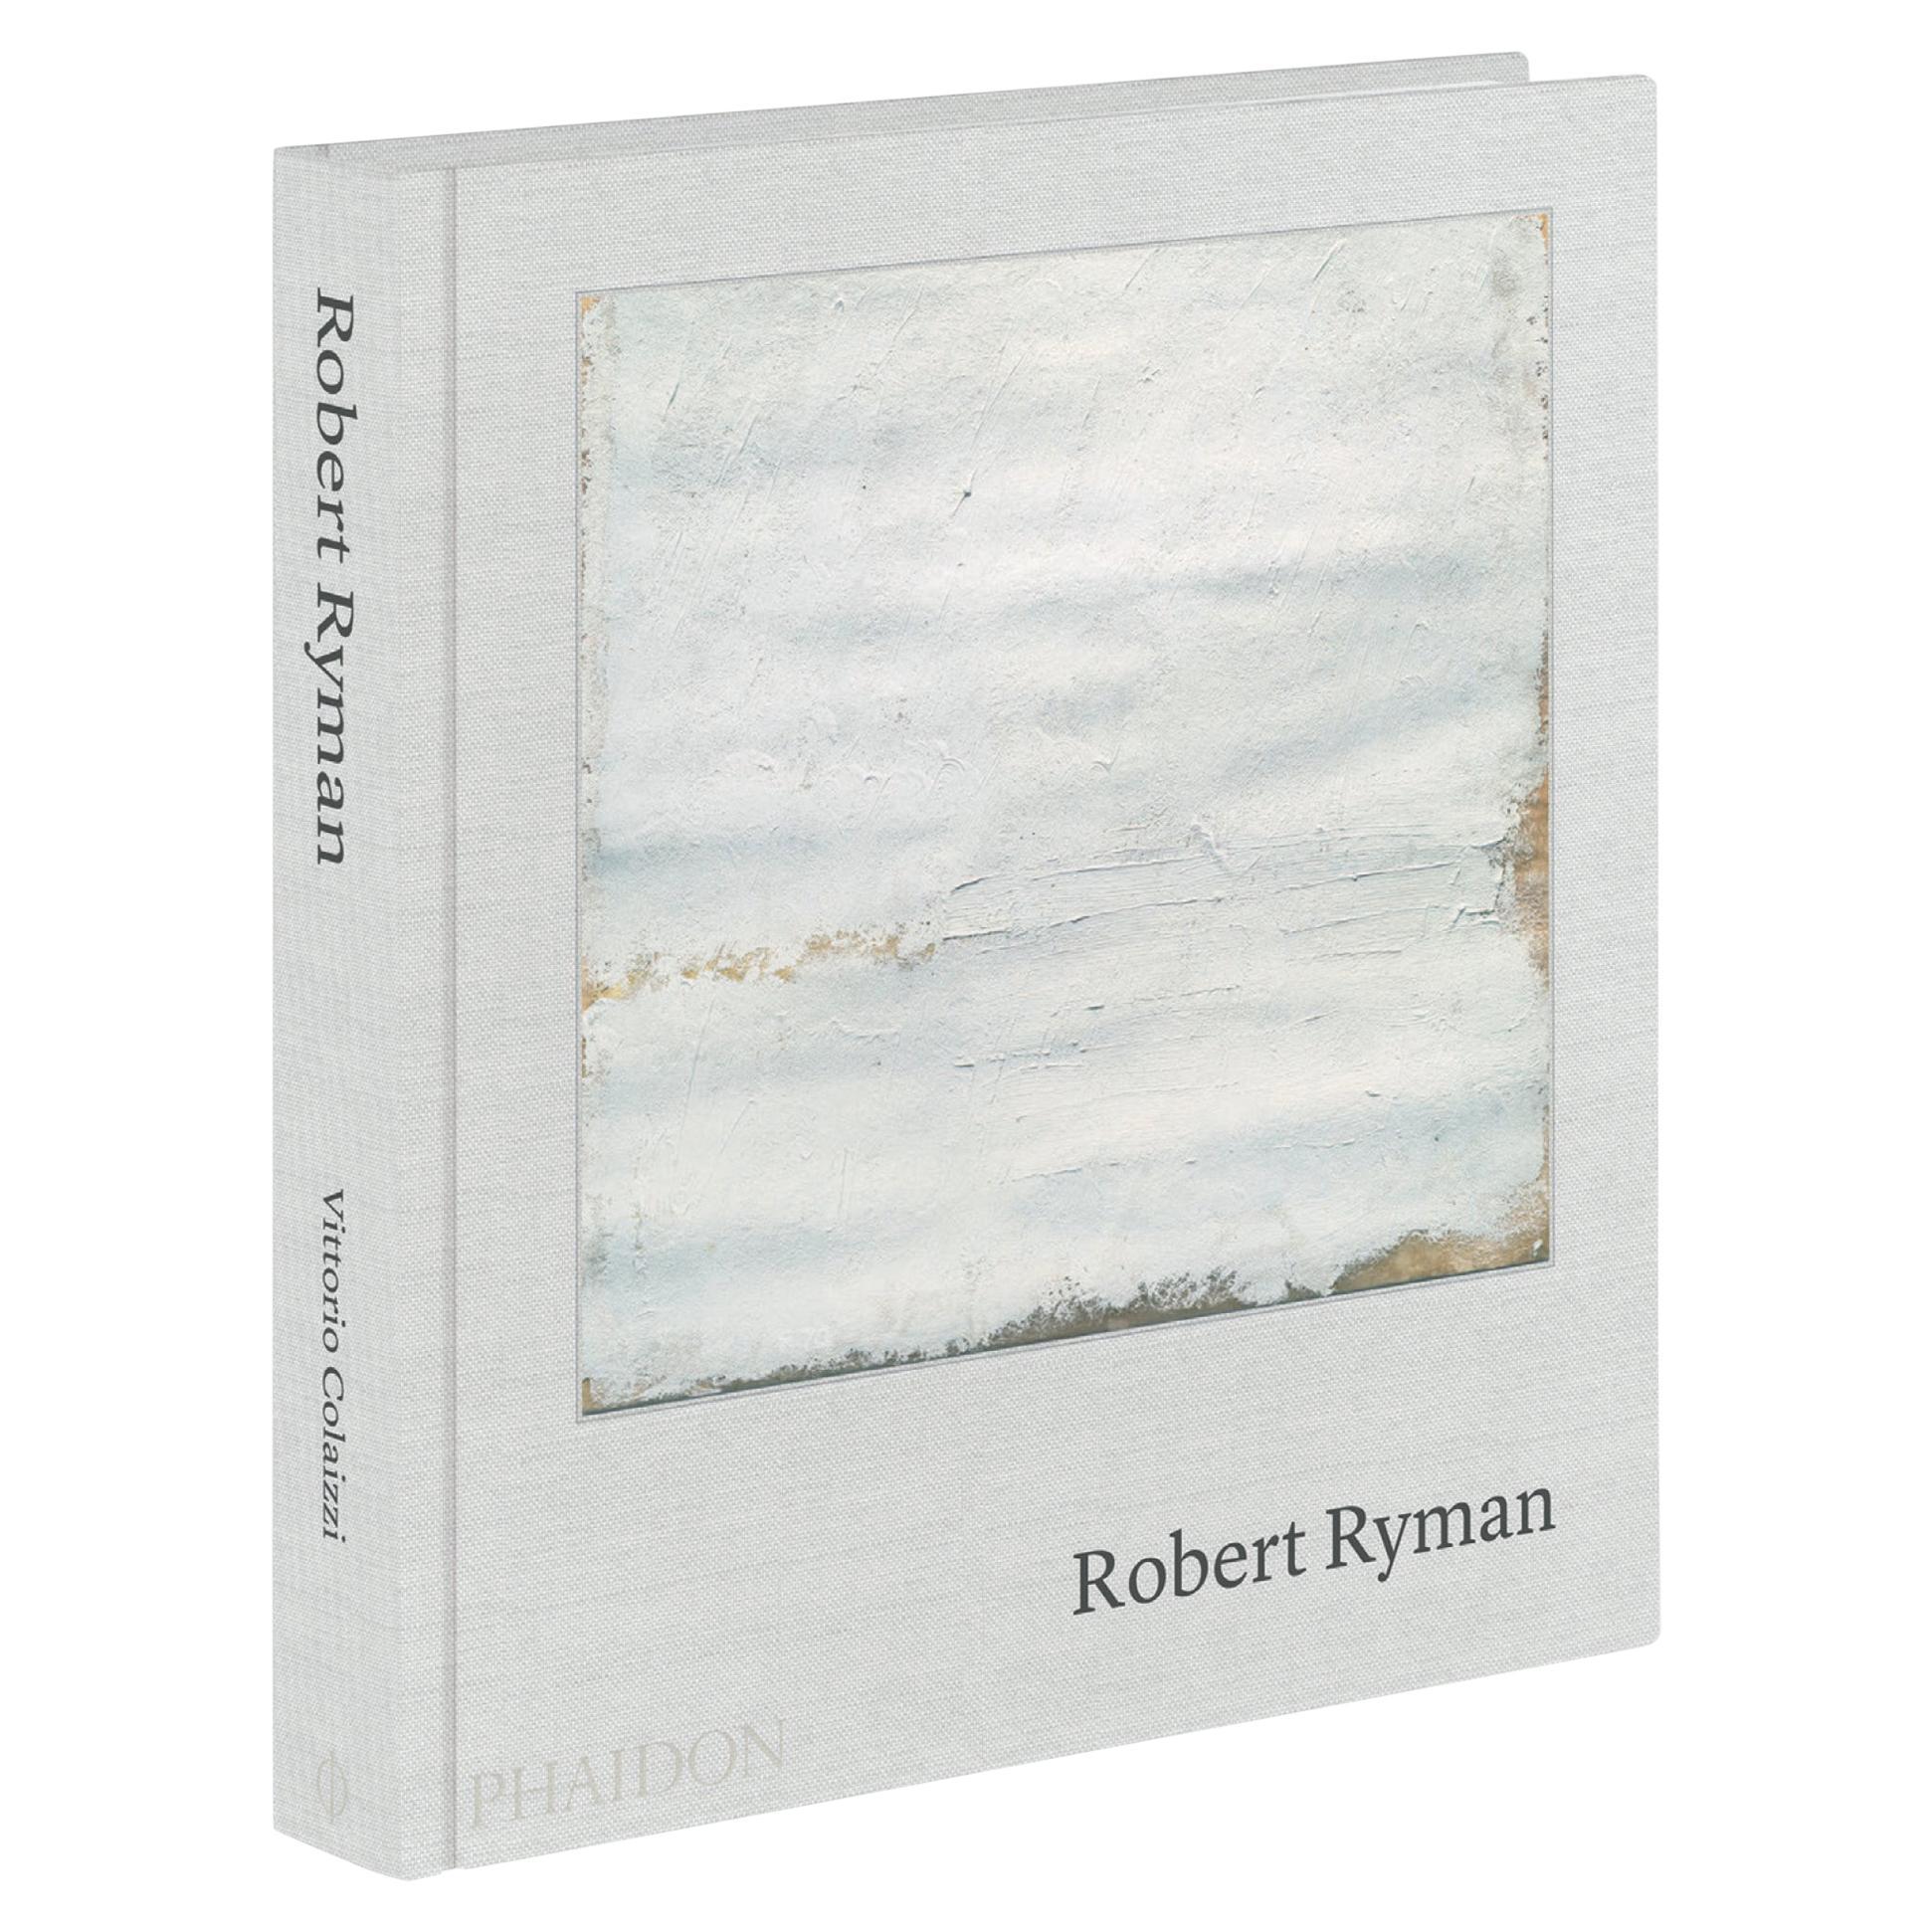 Robert Ryman monograph